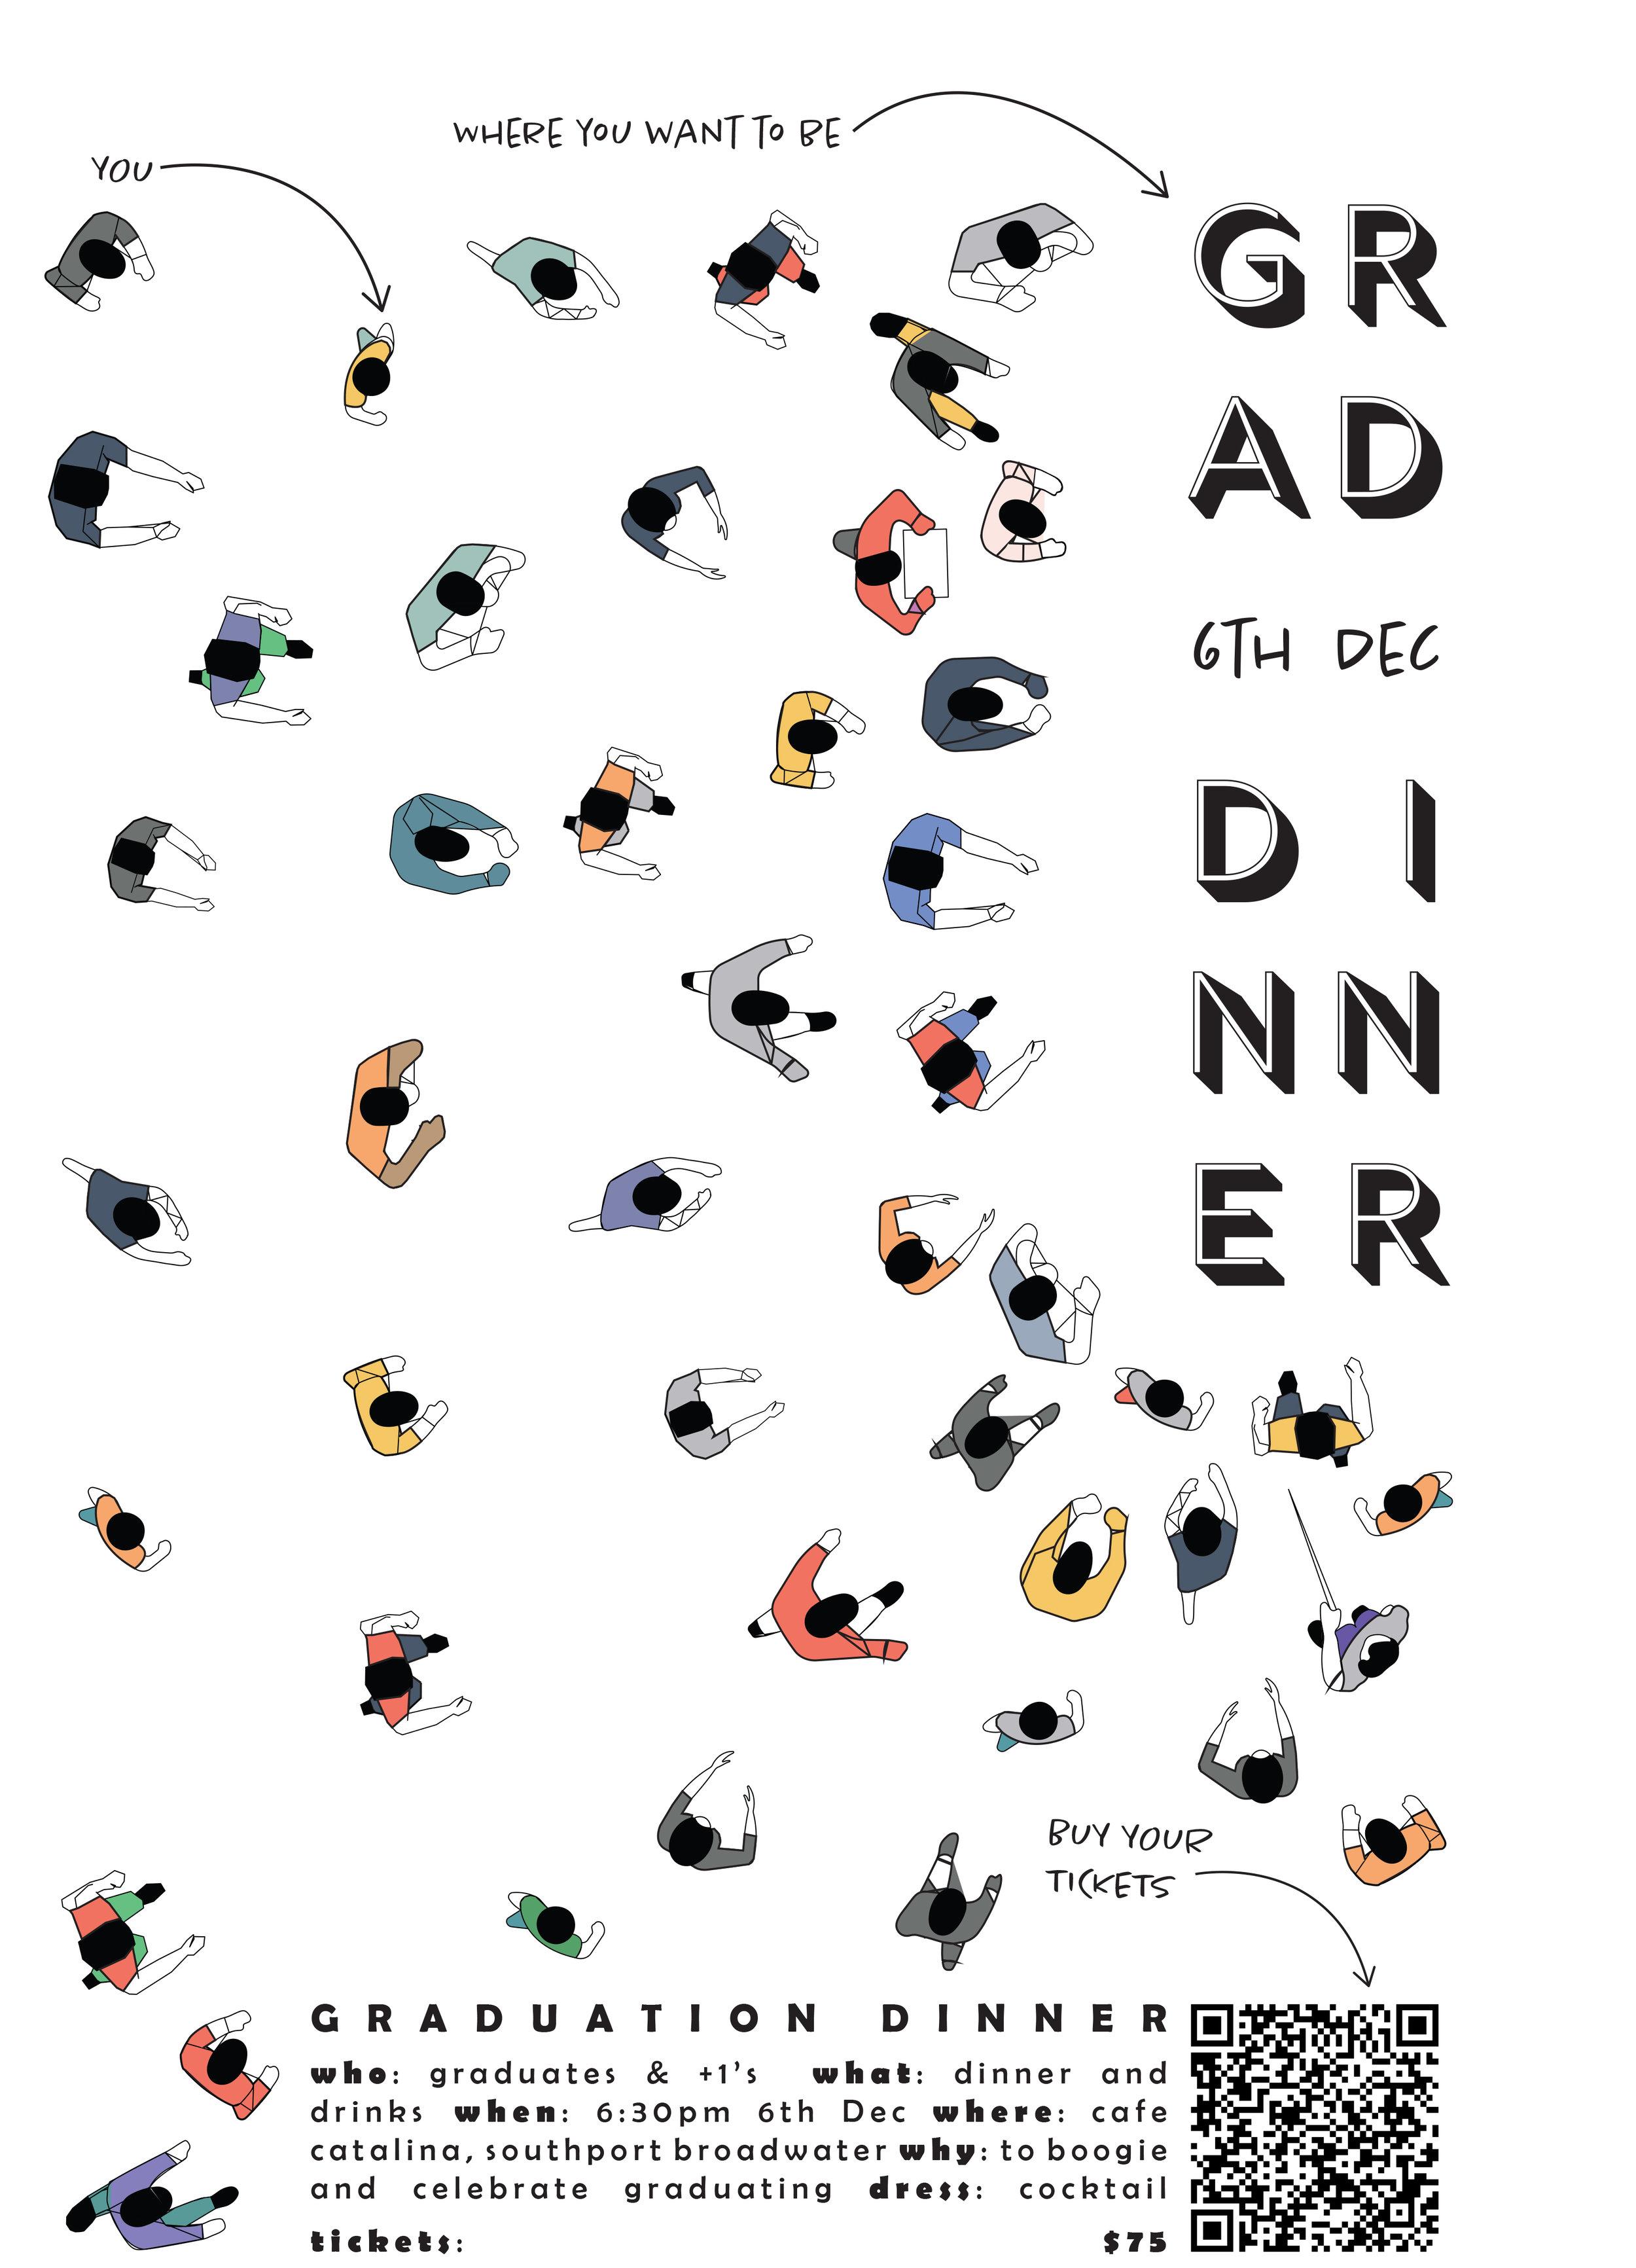 Grad Dinner Poster.jpg